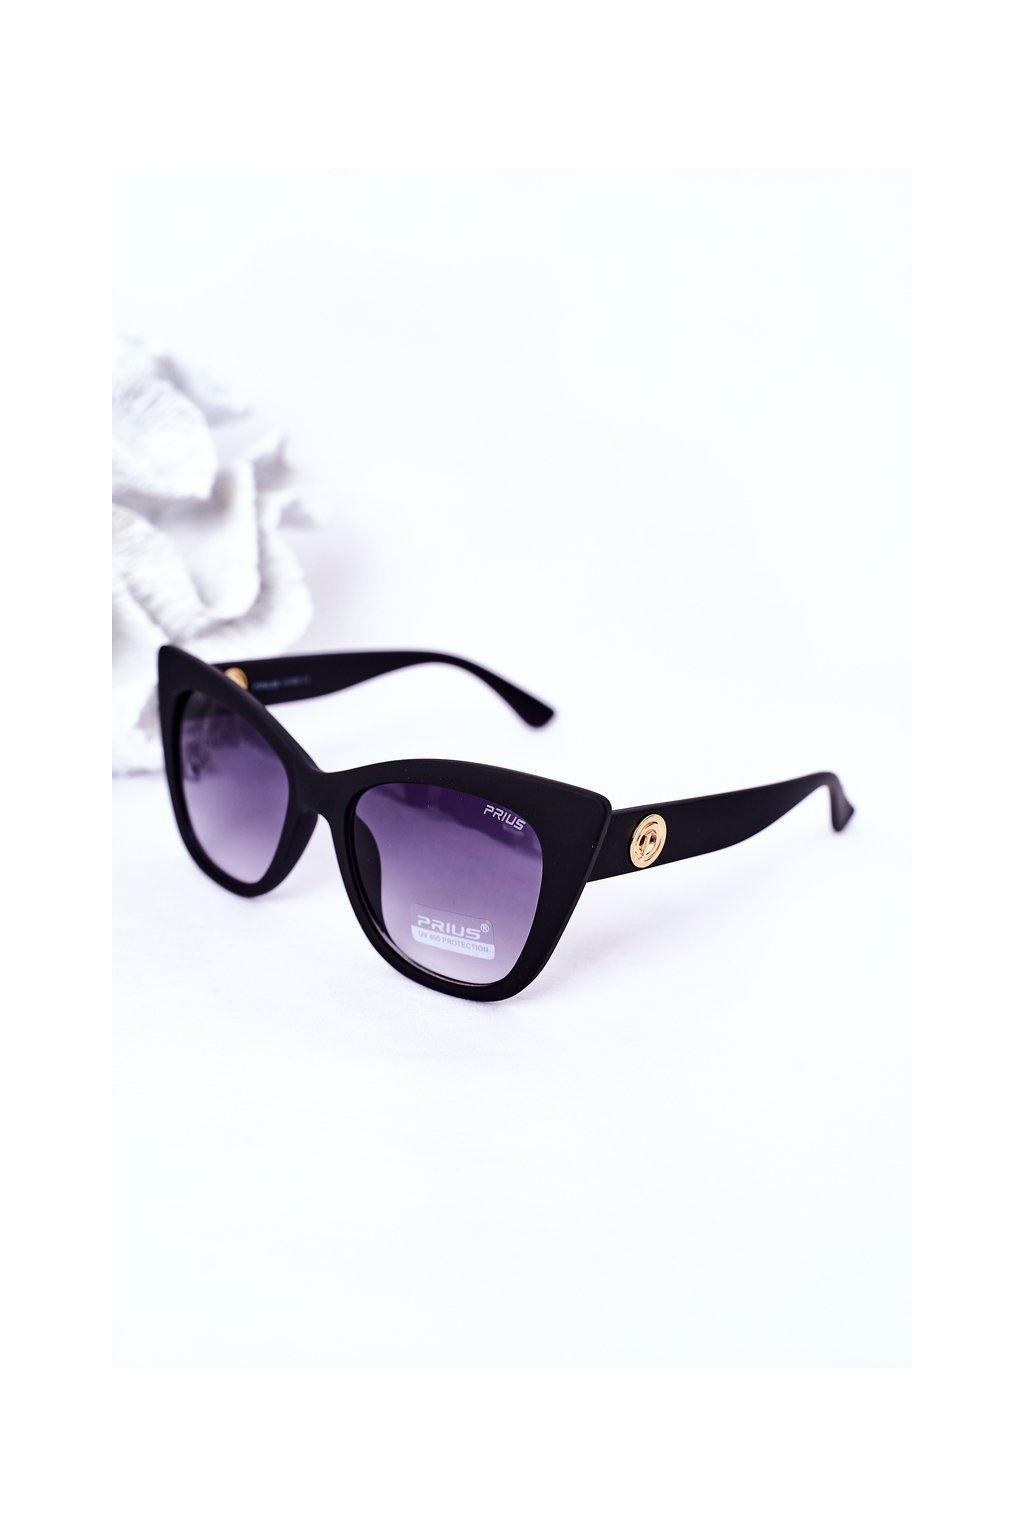 Módne slnečné okuliare čierne matné PRIUS Eyewear PRIUS008 MAT BLK